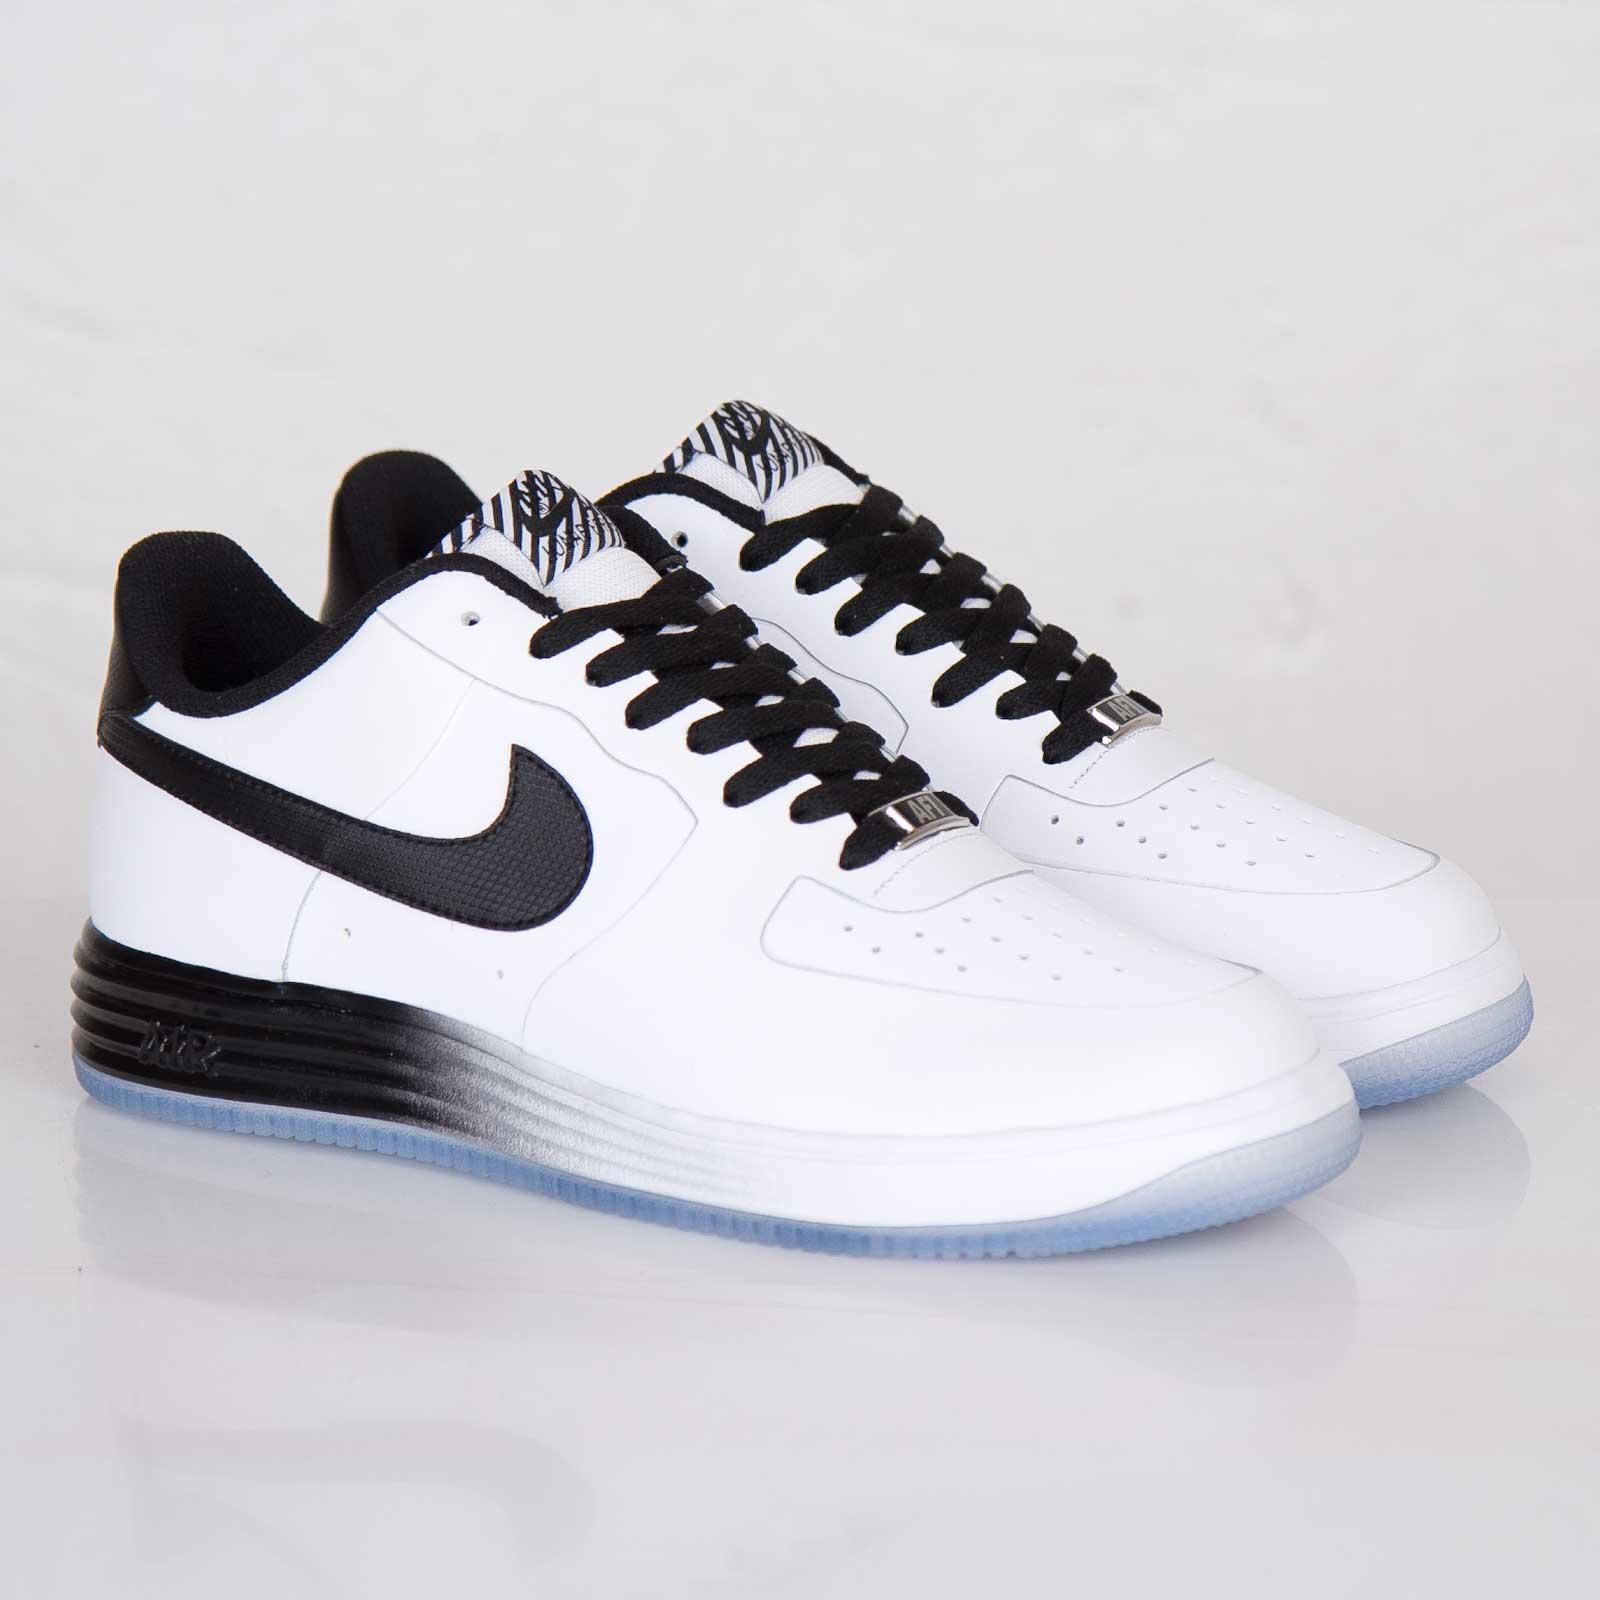 finest selection 31a19 ab363 Nike Lunar Force 1 NS Premium